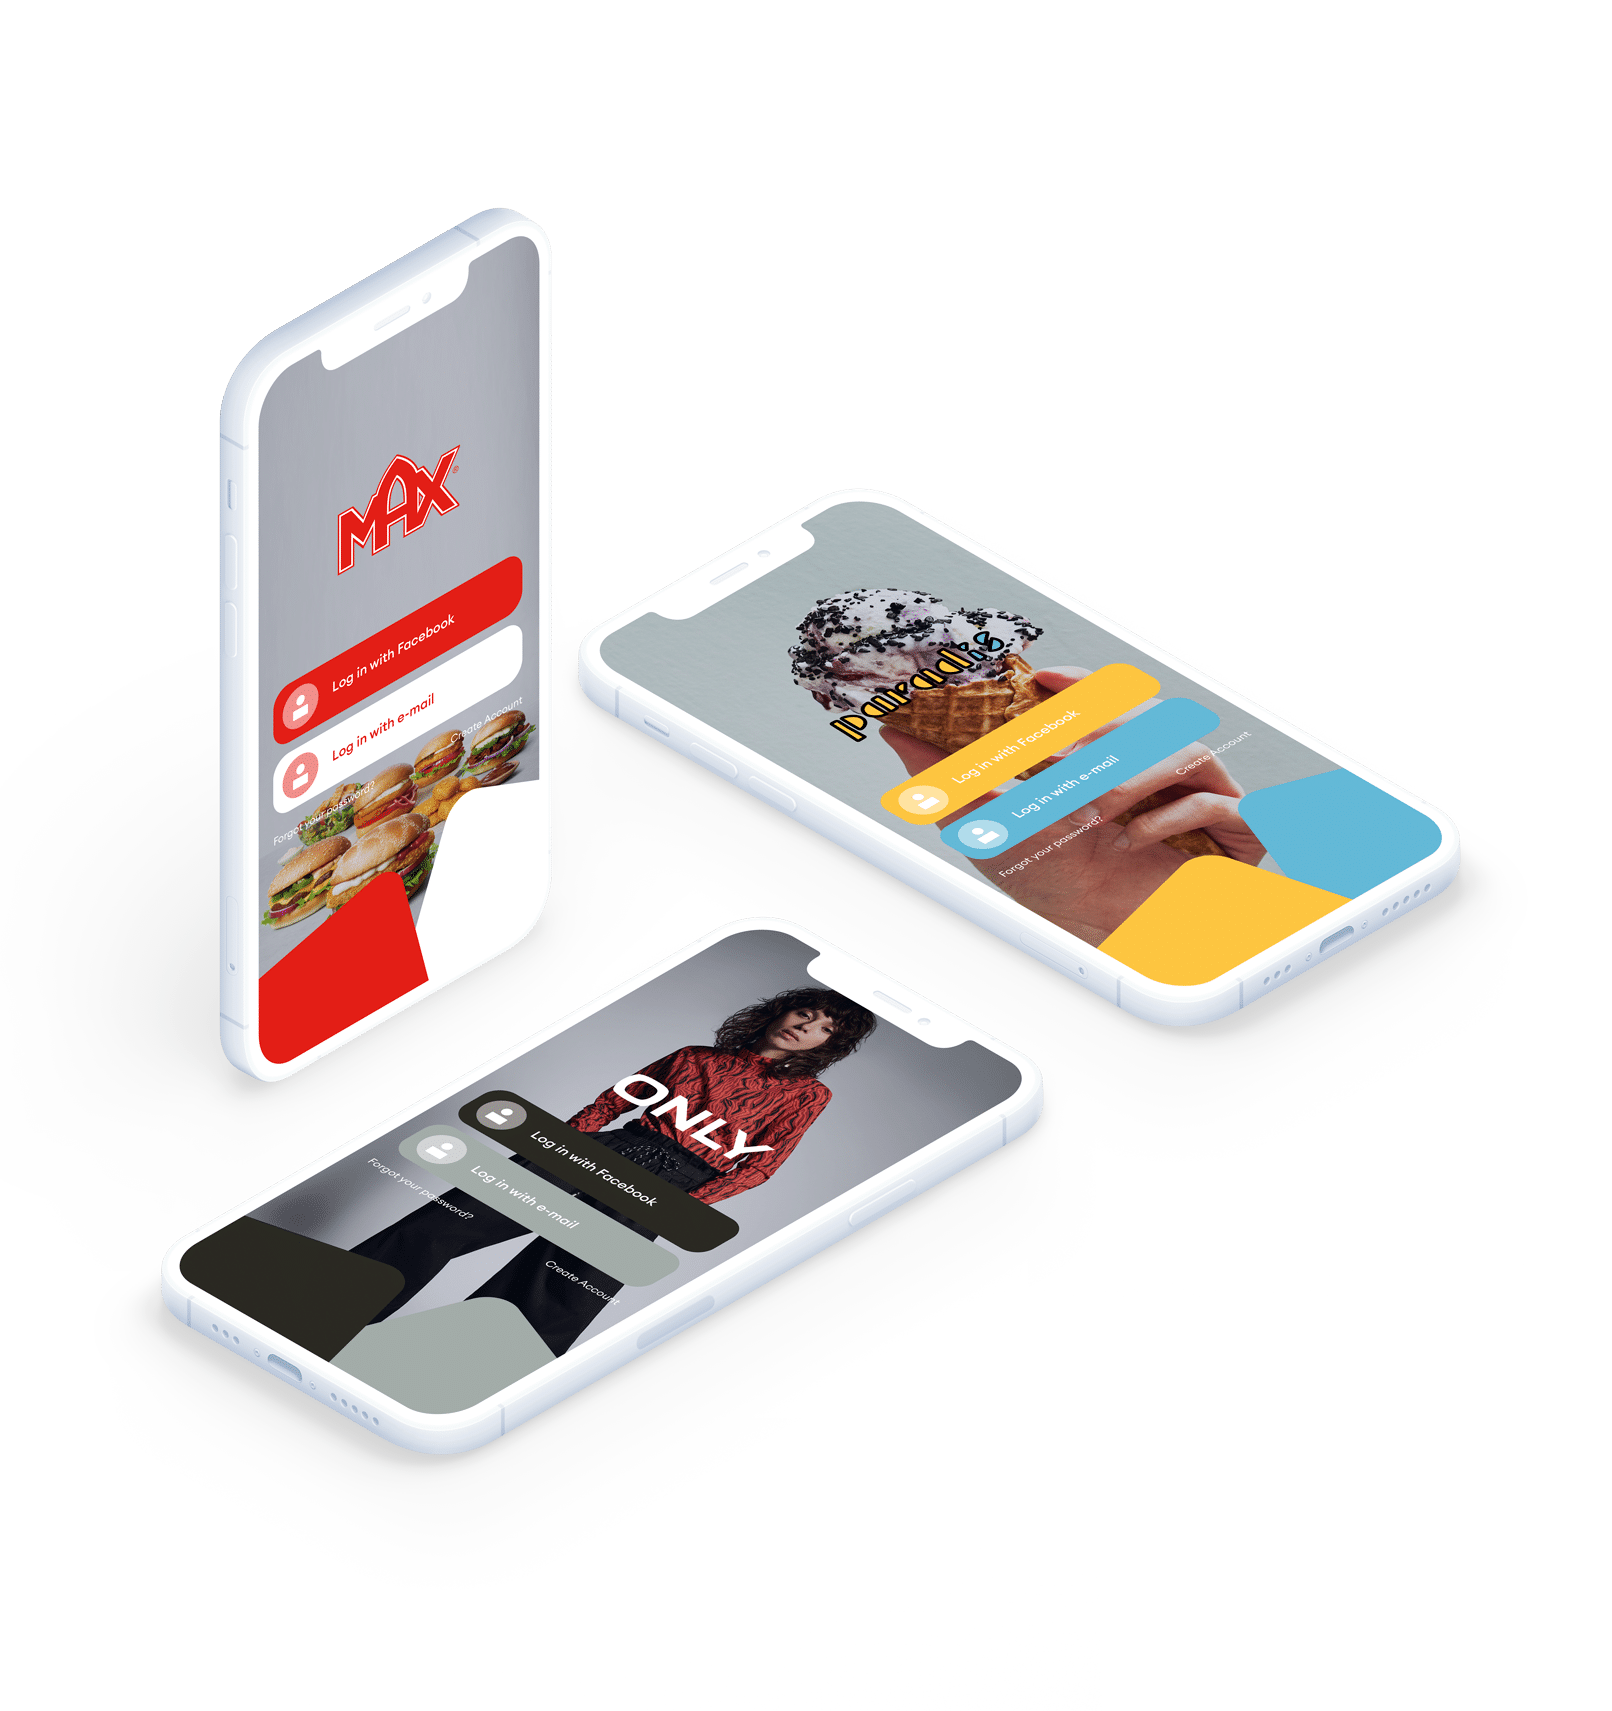 The Best Loyalty Program Apps